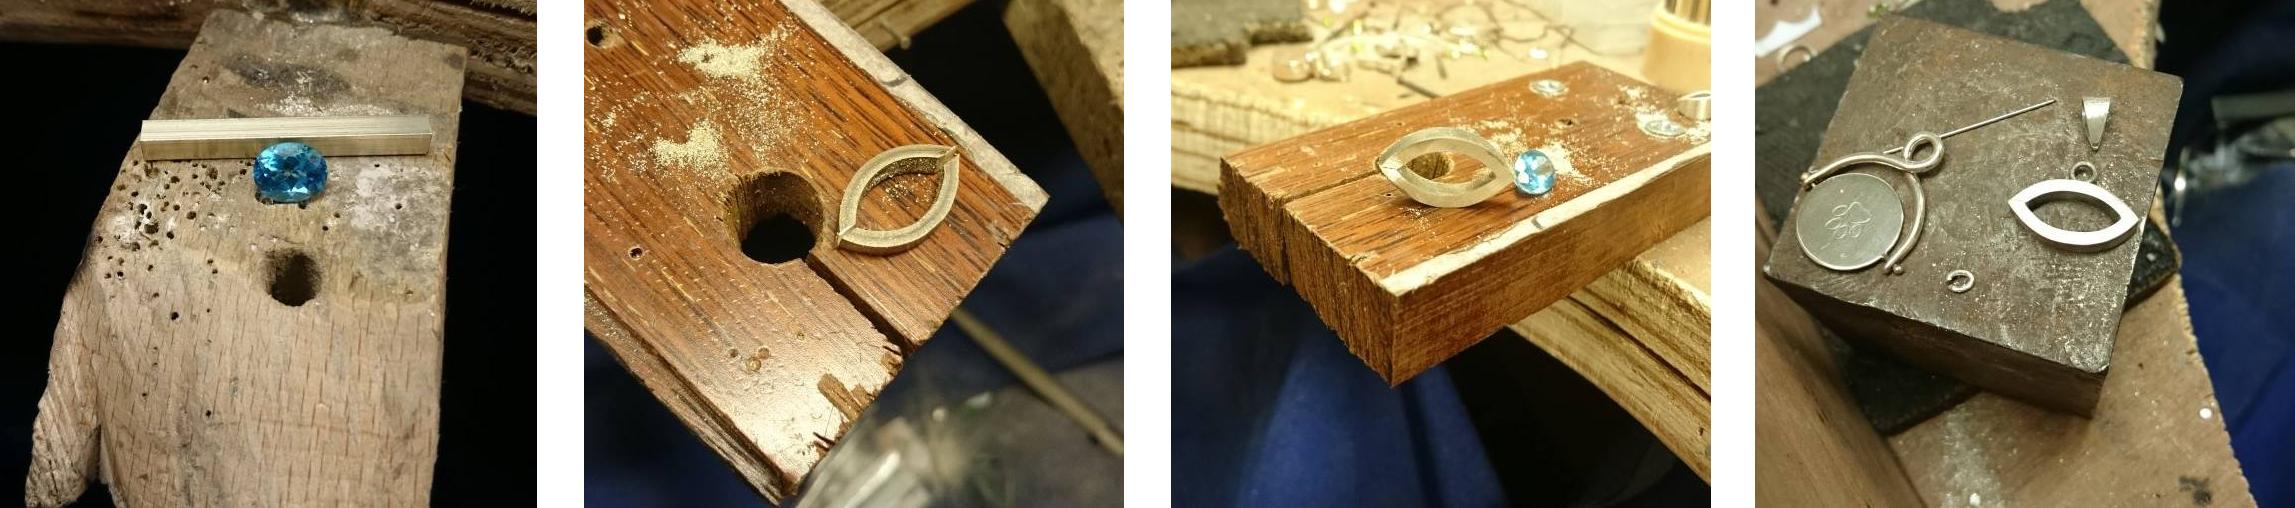 Handmade Jewellery UK, Handmade Gold Evil Eye & Swiss Blue Topaz Necklace